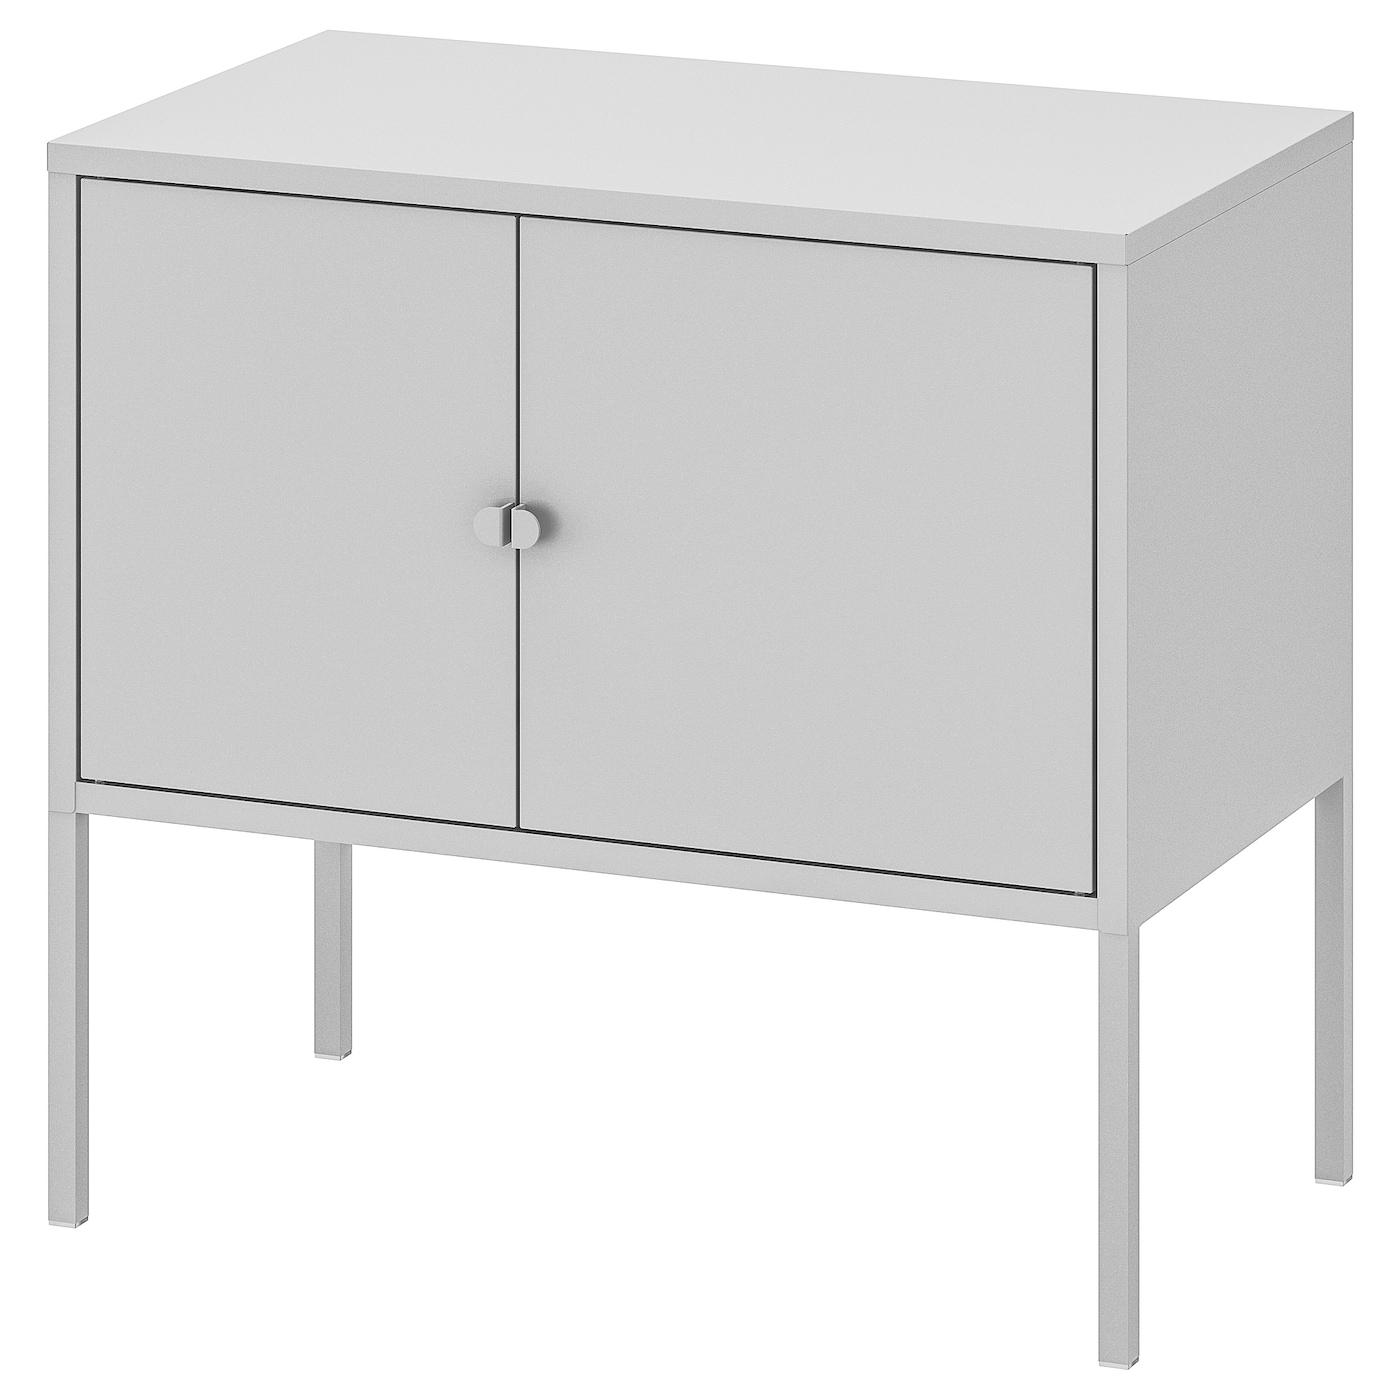 IKEA LIXHULT szara metalowa szafka, 60x35 cm